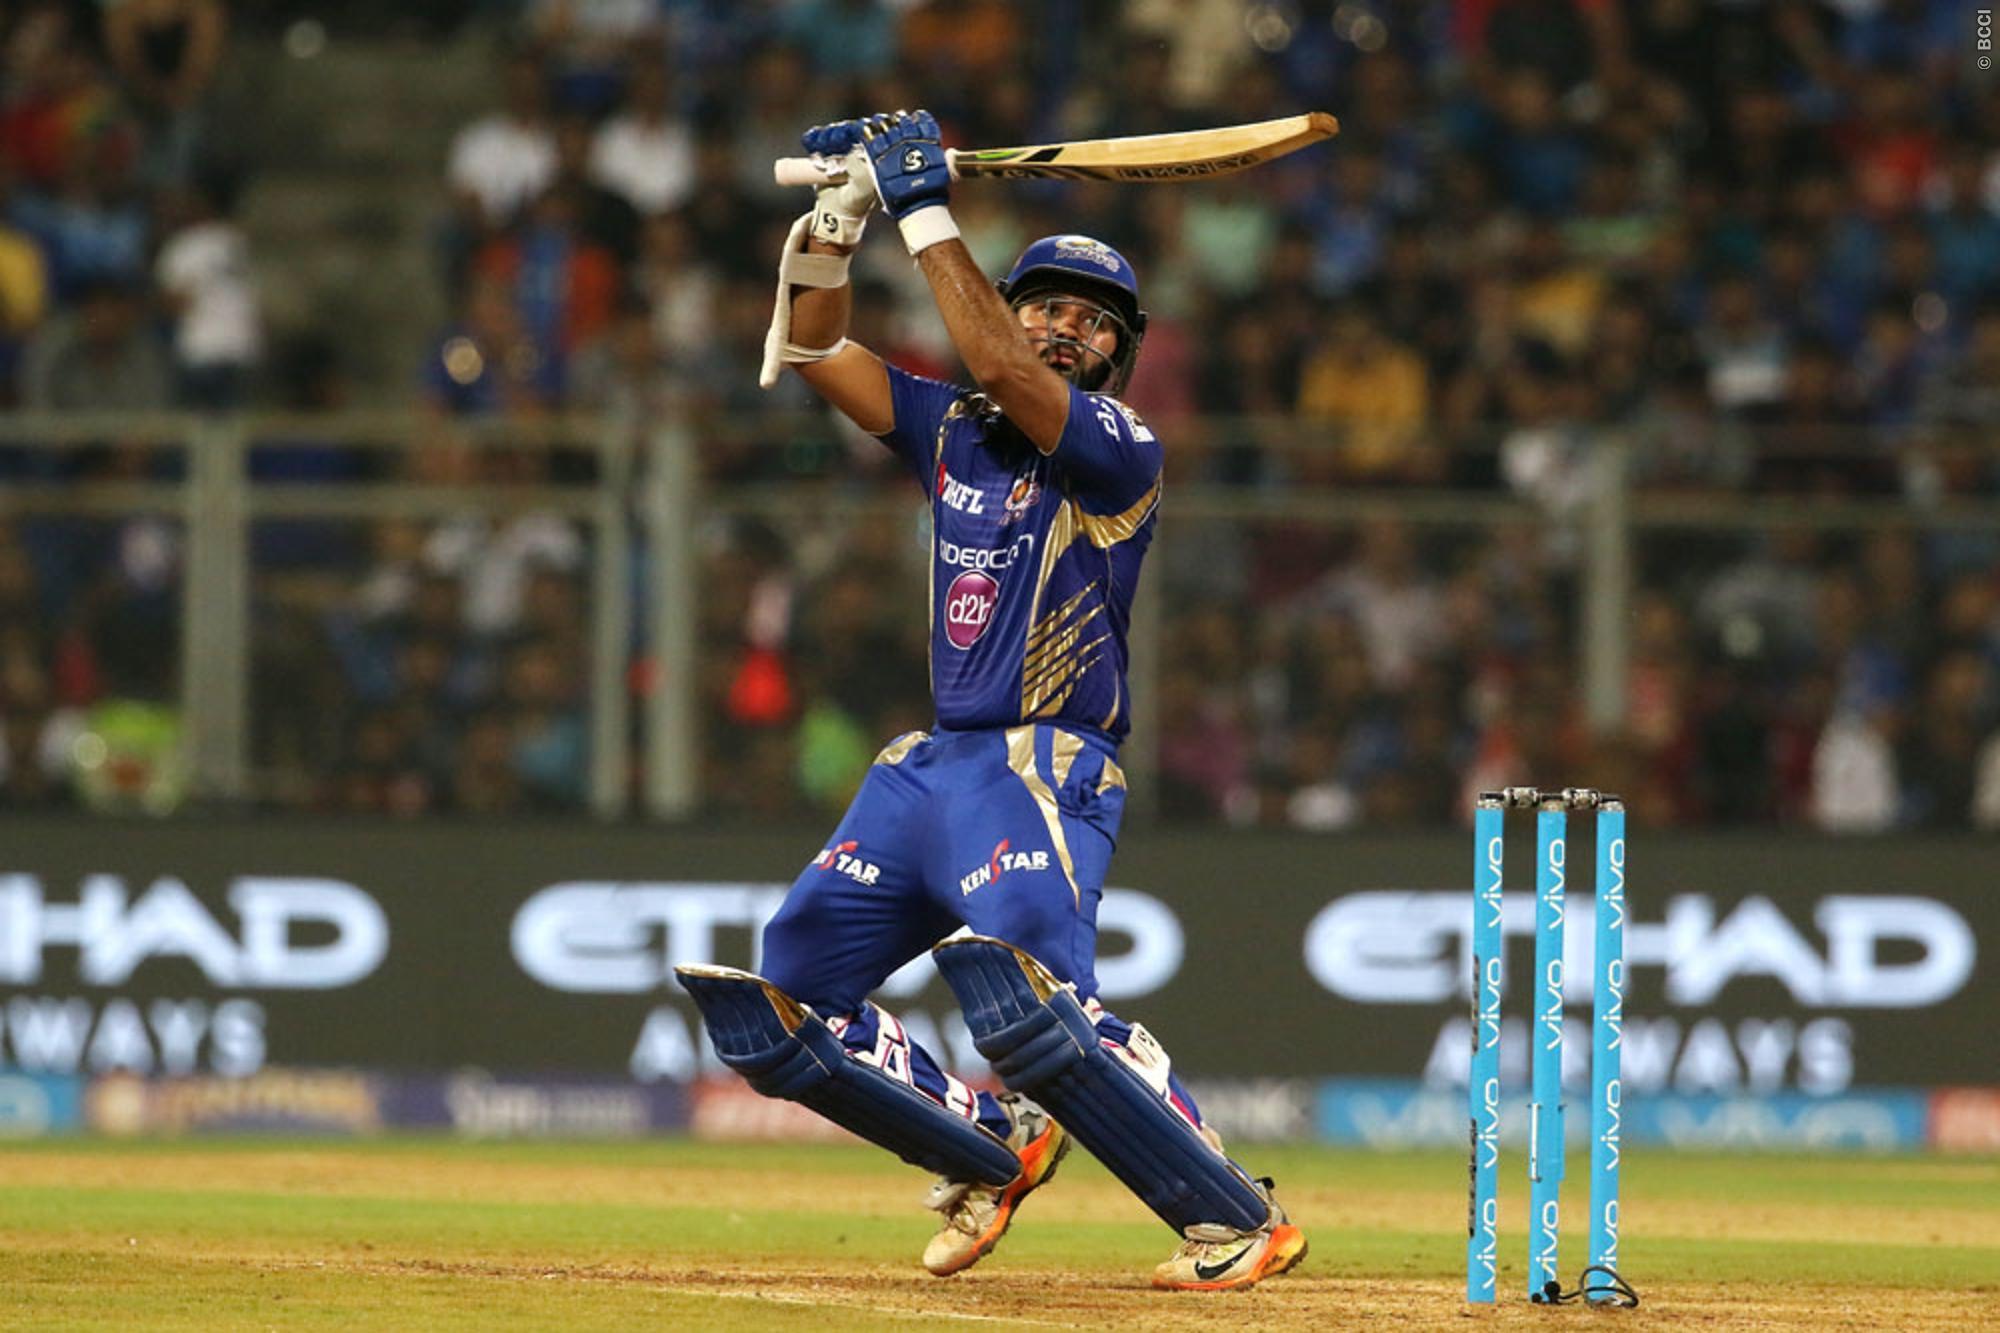 Watch Mumbai Indians vs Sunrisers Hyderabad Highlights